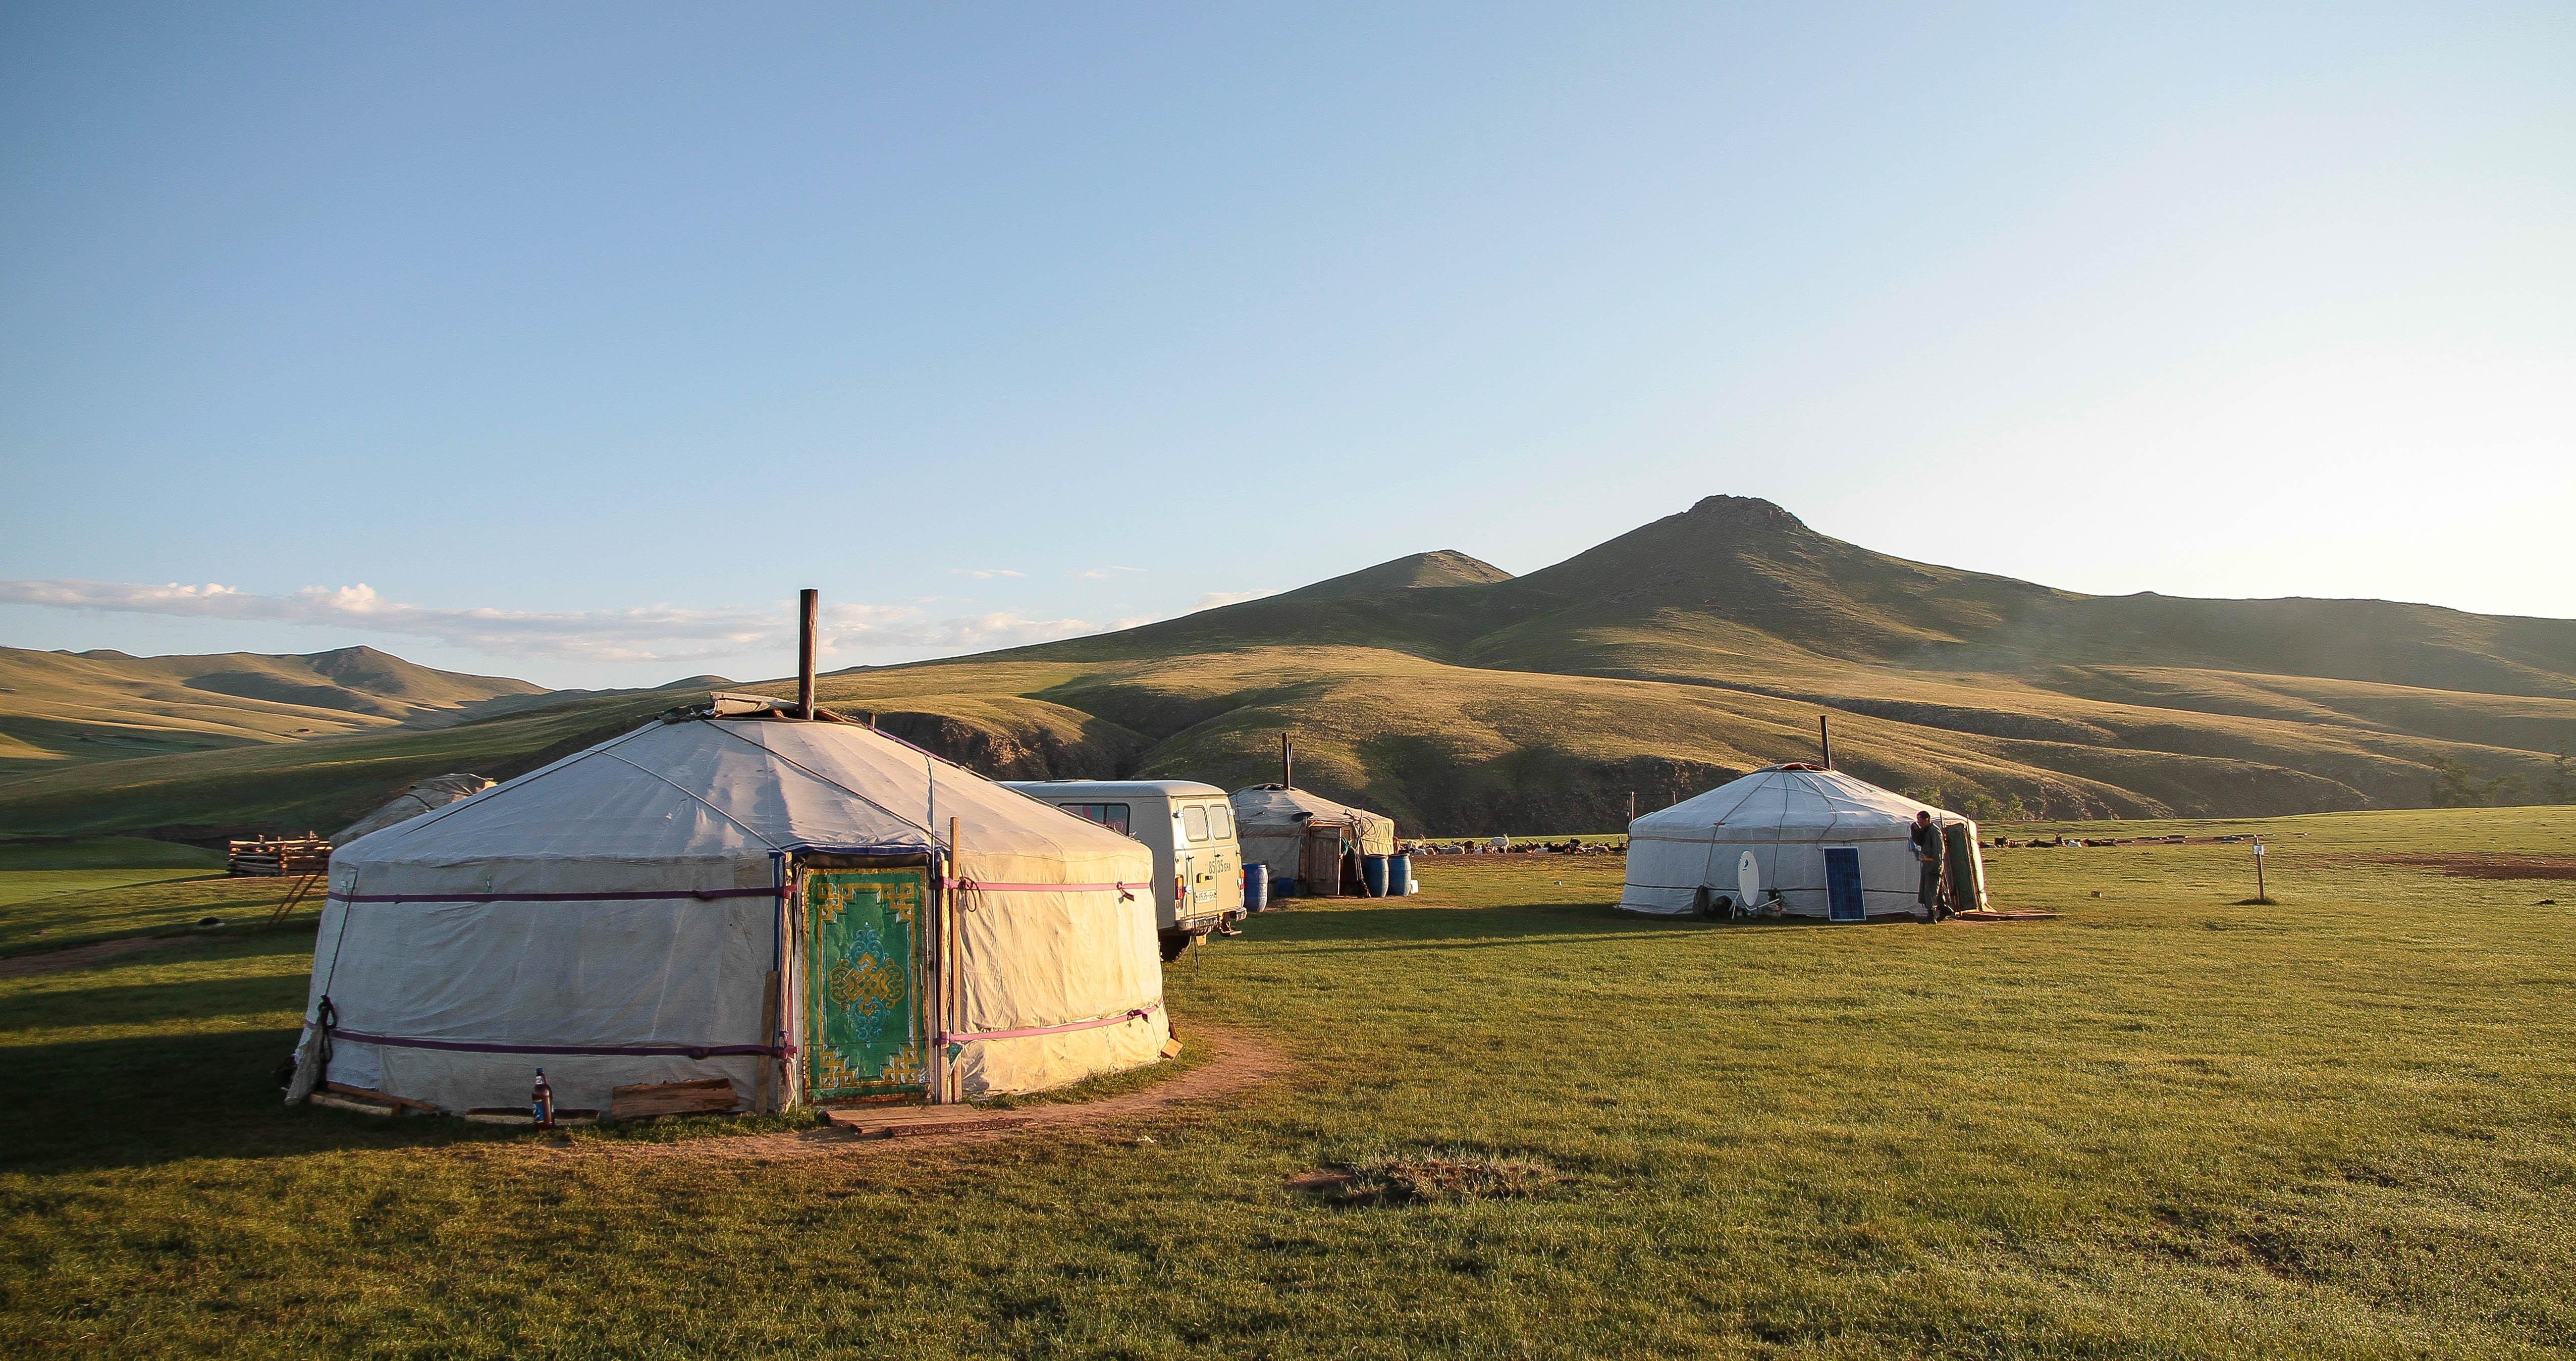 Kazakh Yurta house